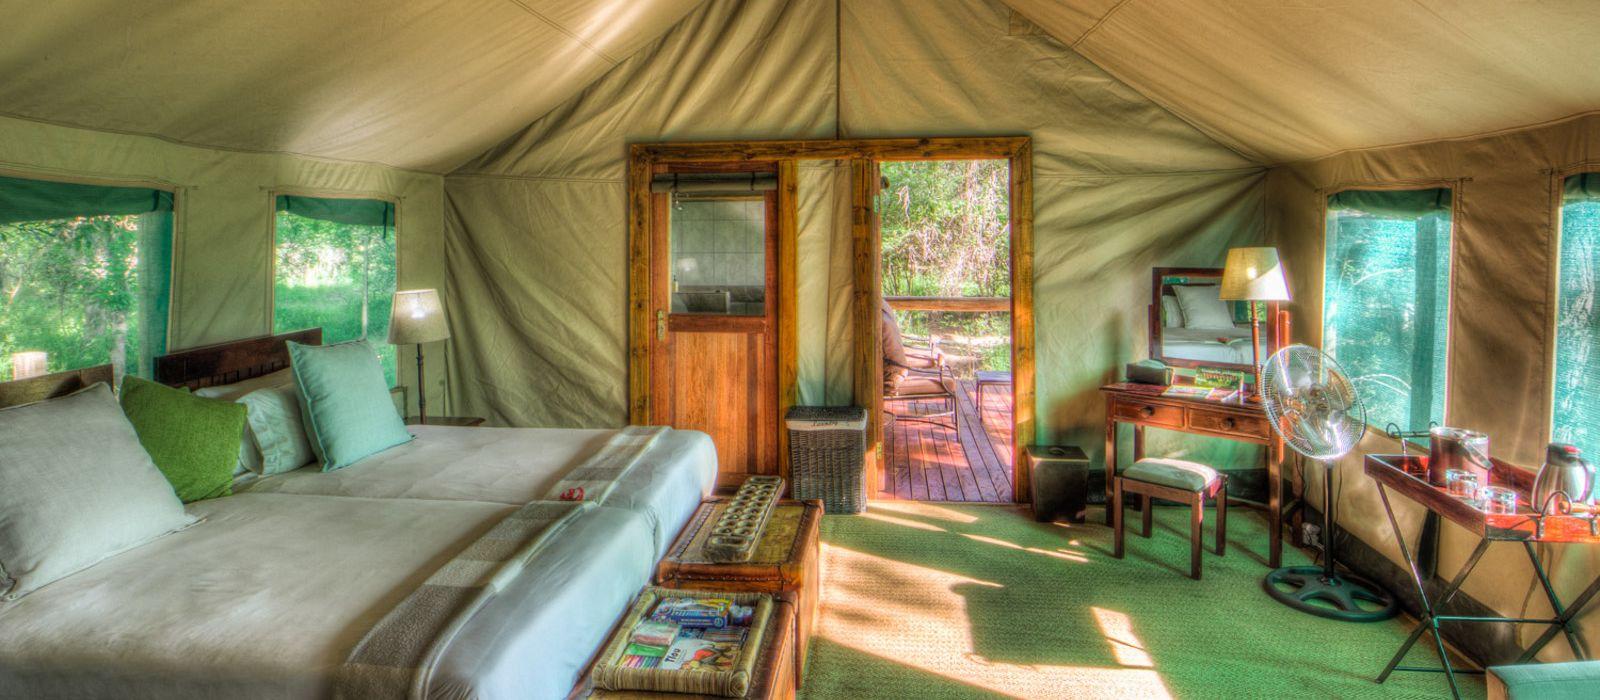 Hotel Camp Moremi Botswana